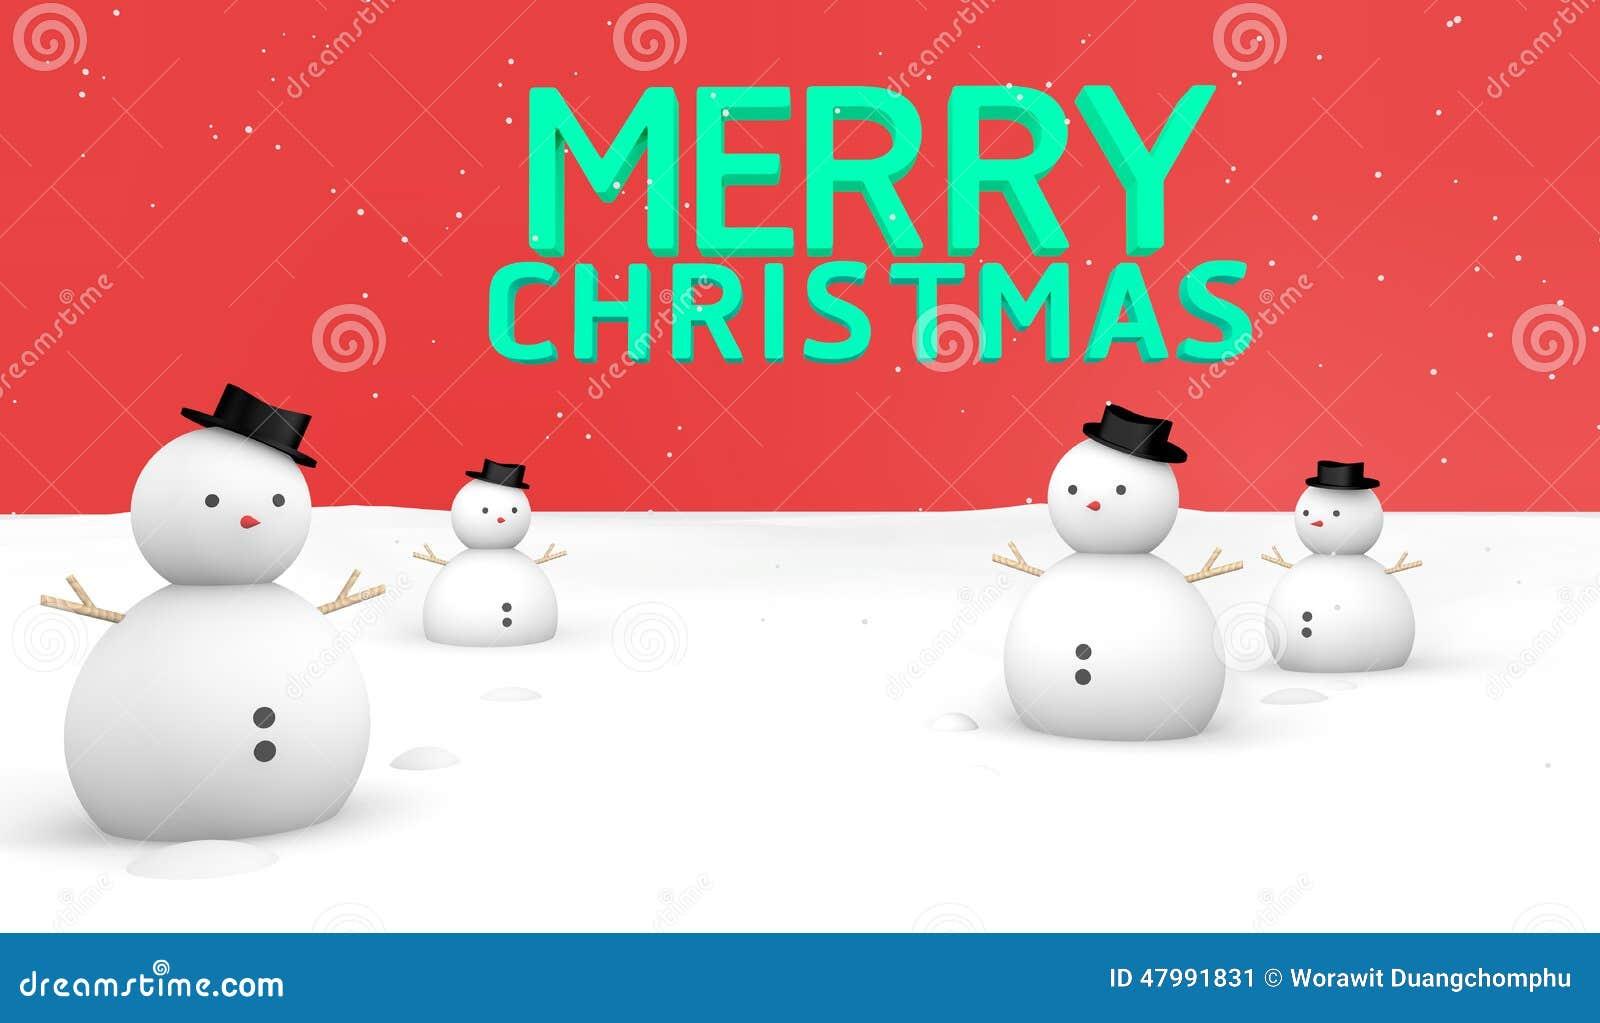 merry christmas snow ground stock illustration illustration of